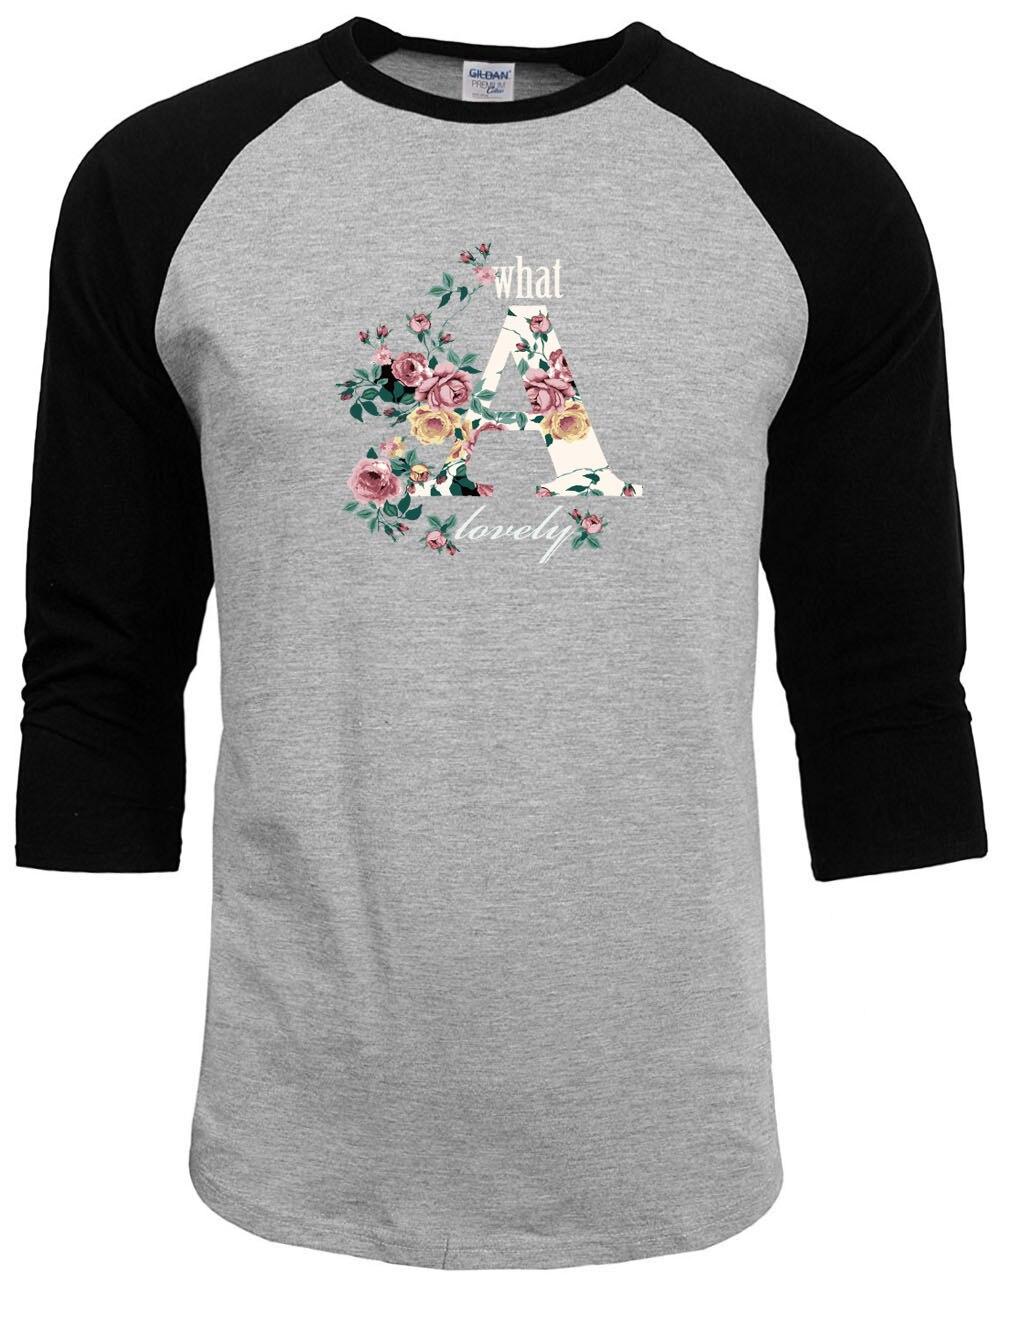 2017 new fashion brand T shirts Women men Tops streetwear ...